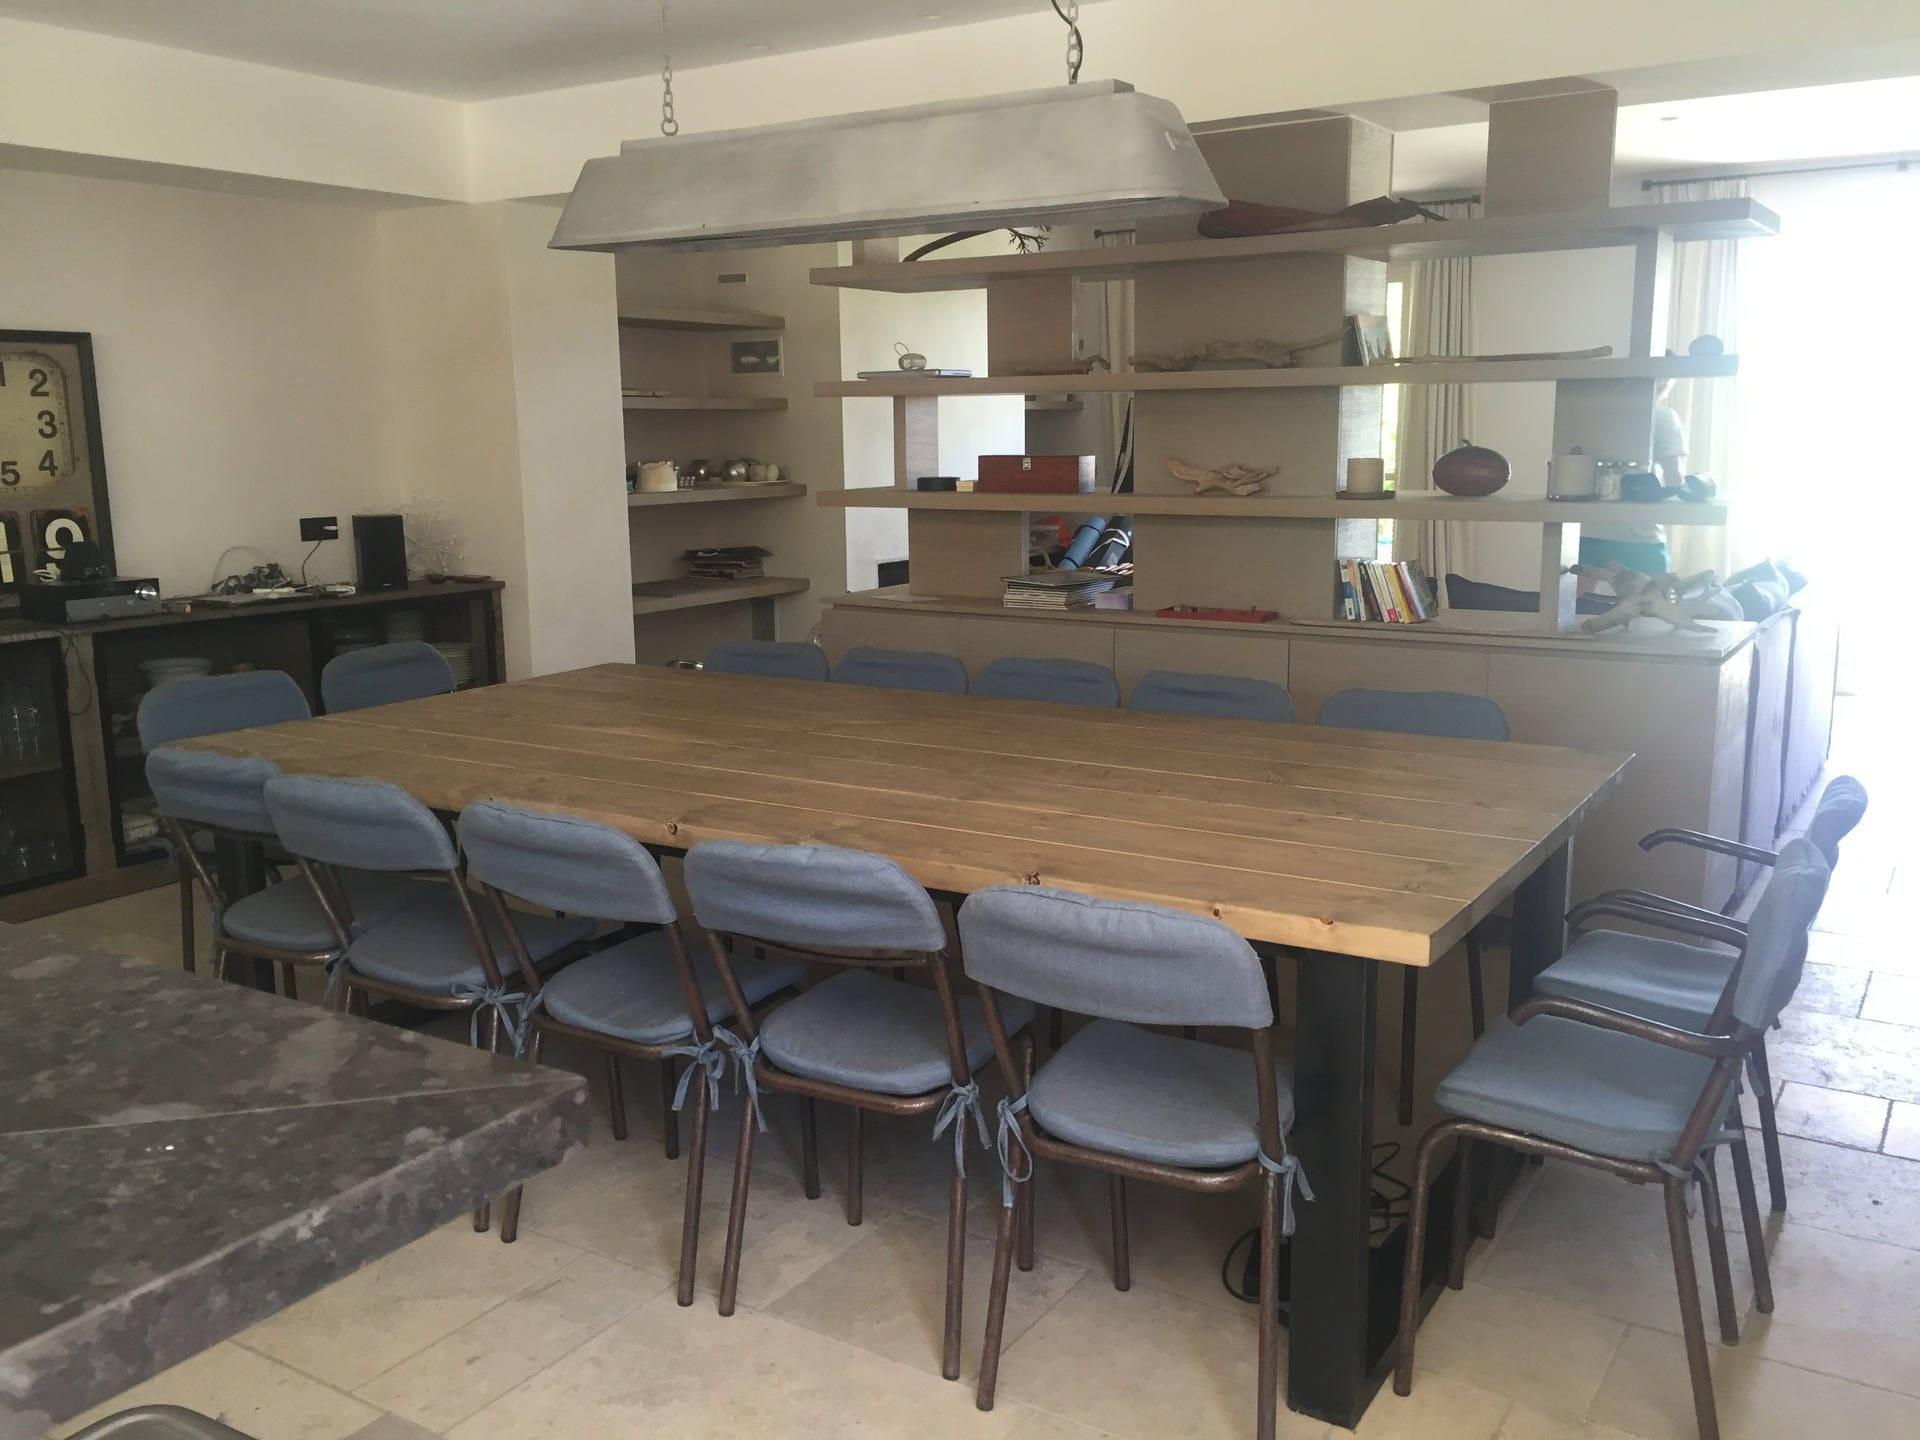 table de salle manger style industriel xxl pied en acier